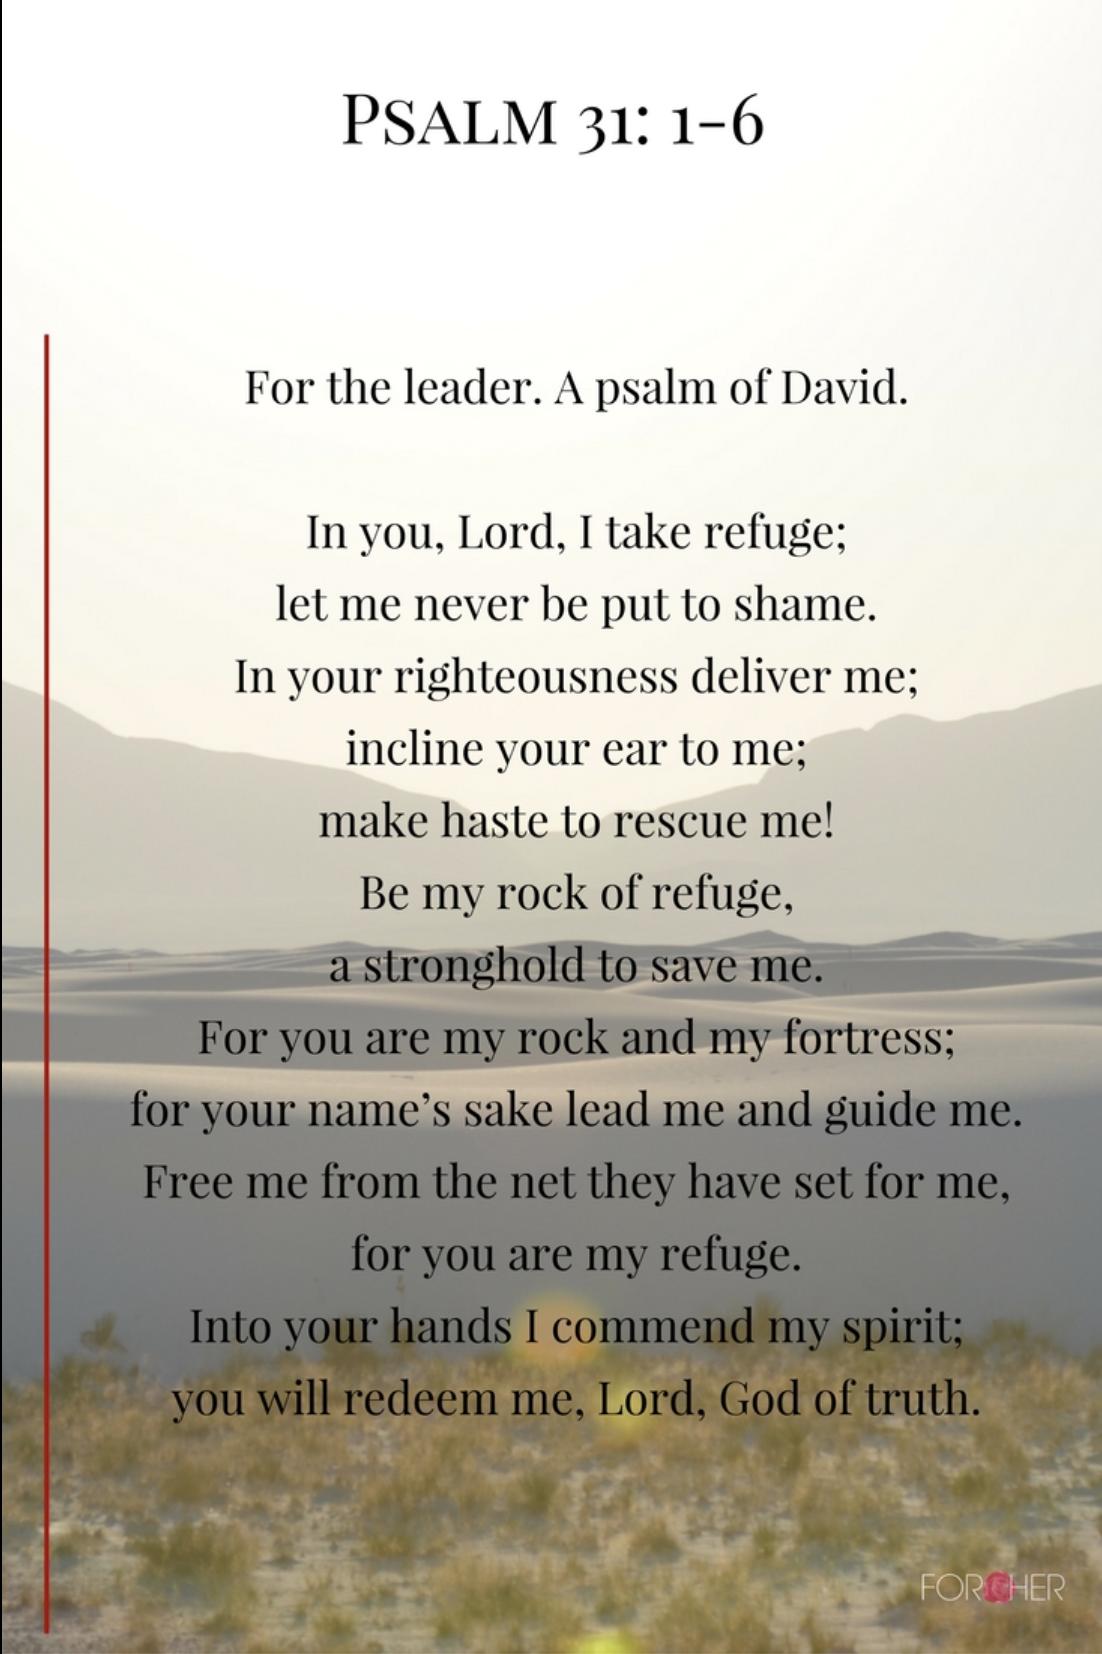 PSALM 31 1-6